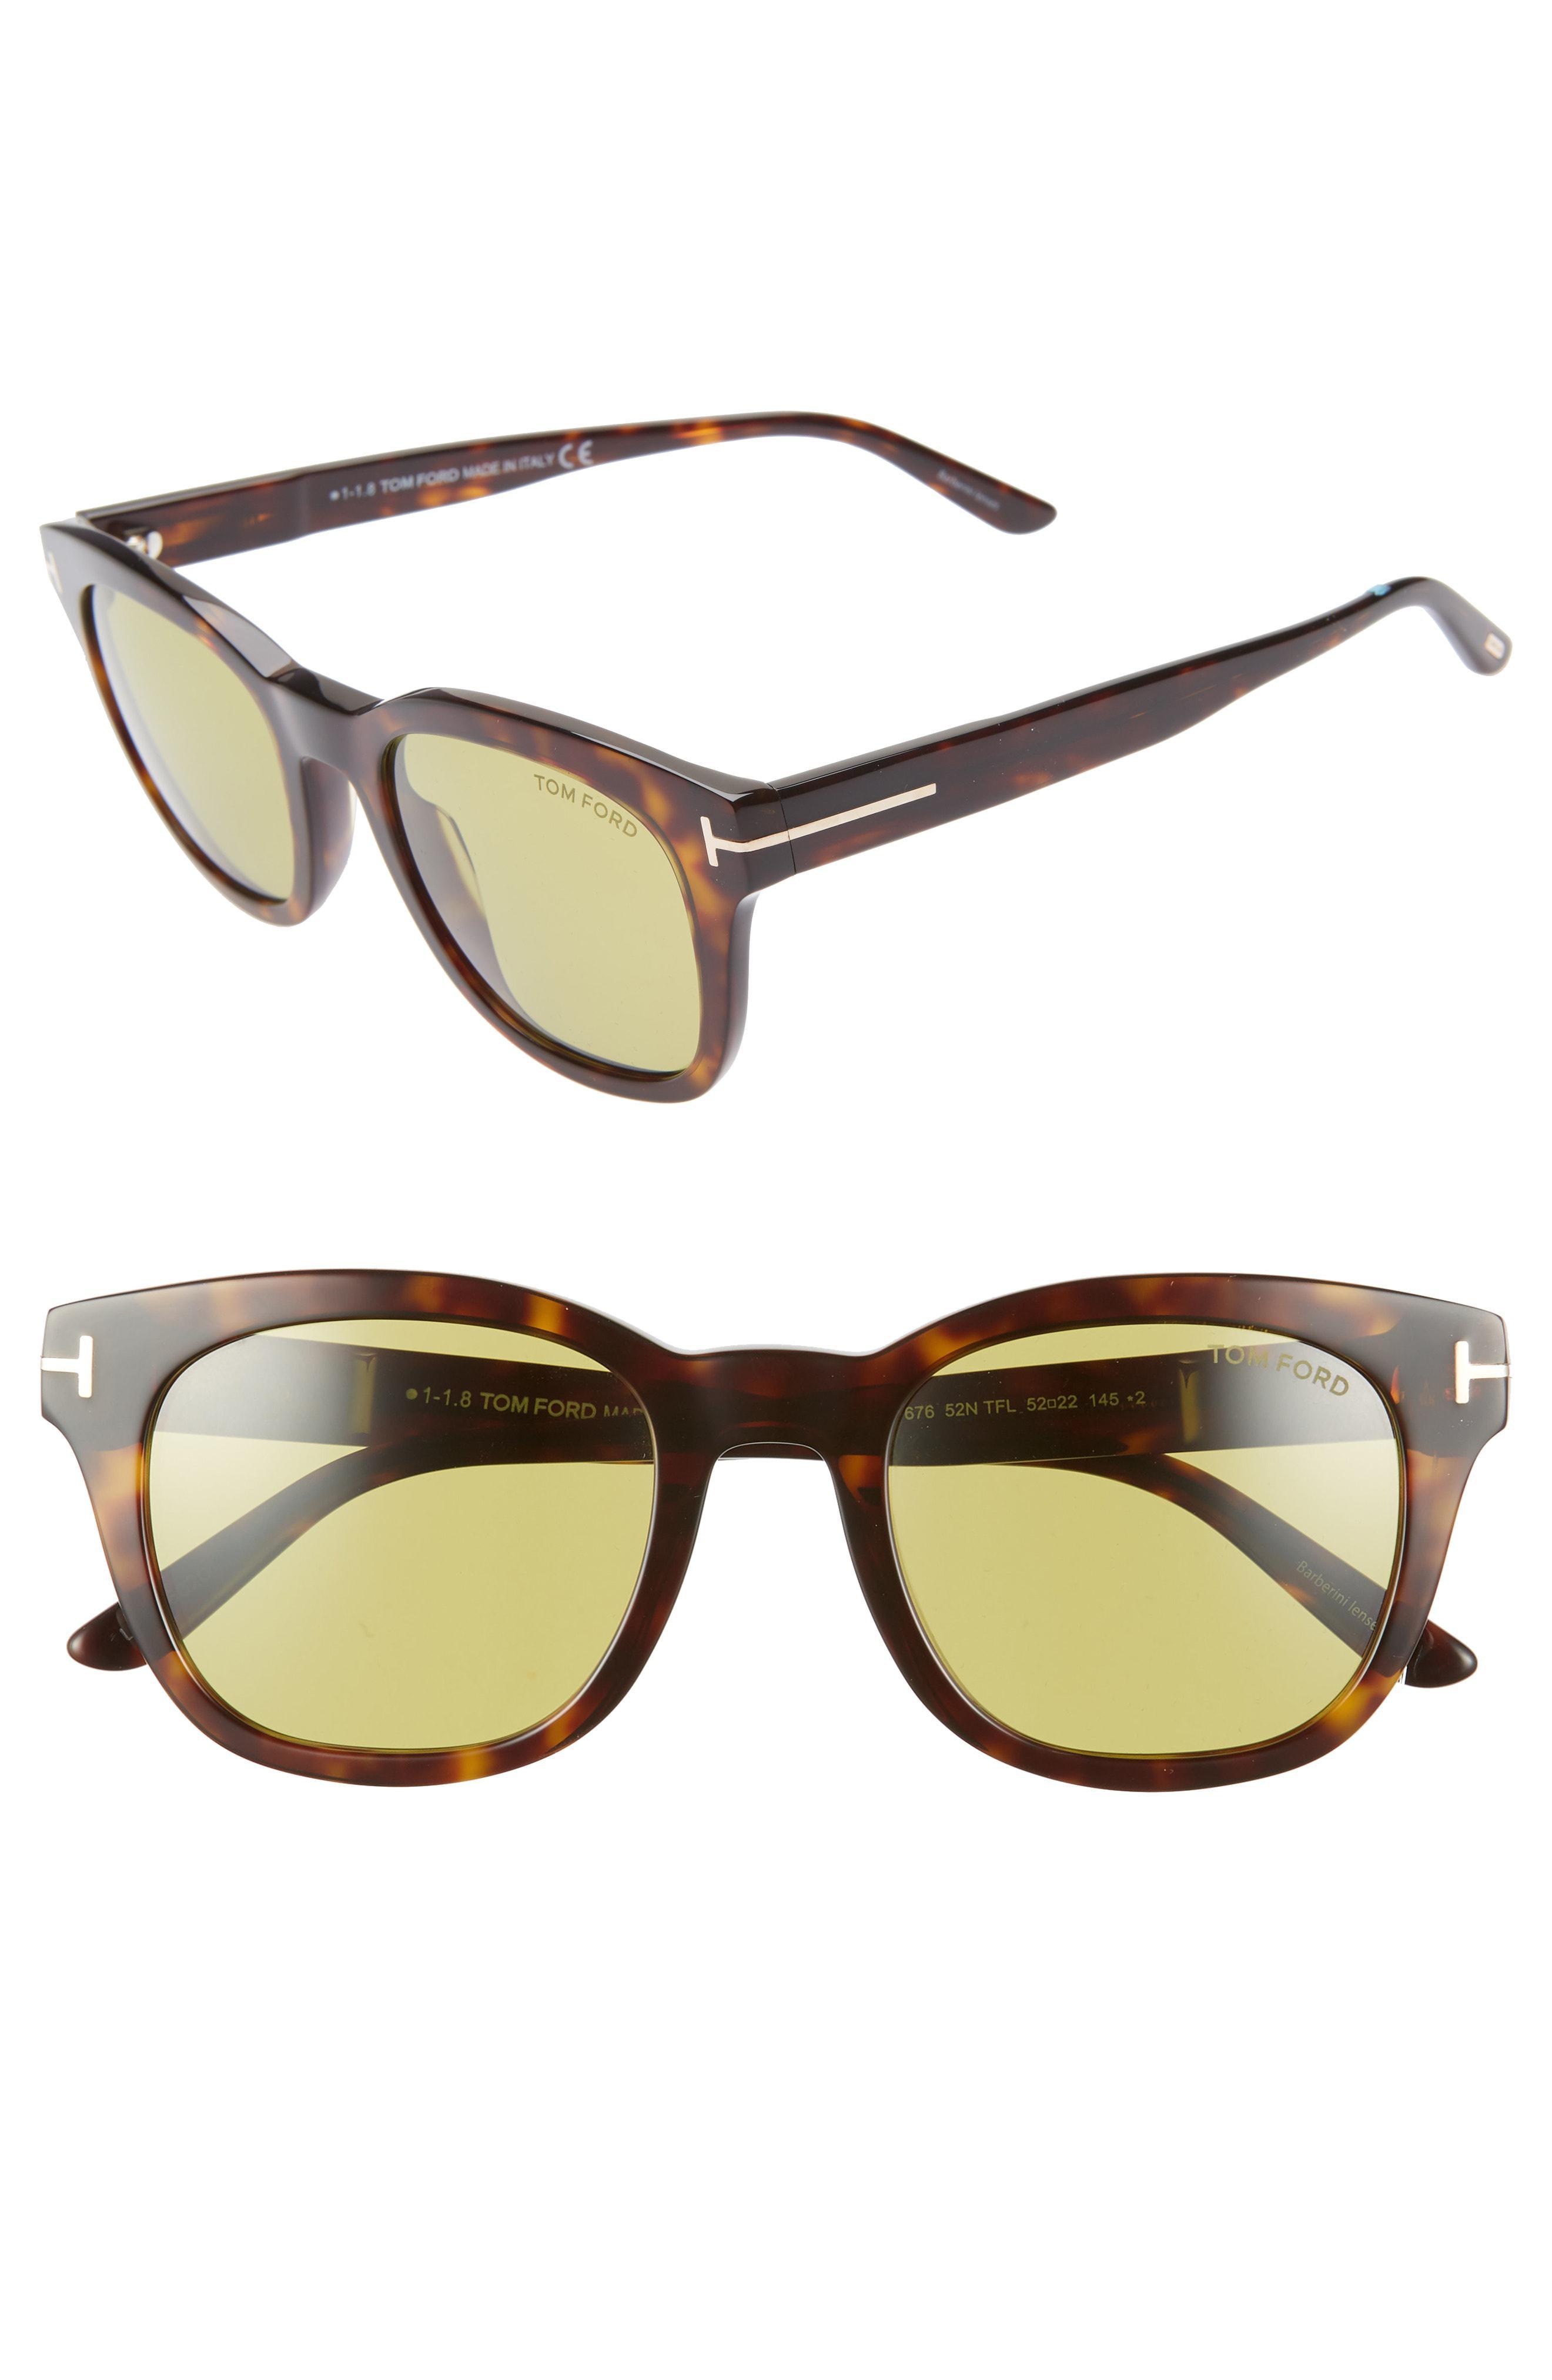 22d96cfdf8 Tom Ford - Eugenio 52mm Sunglasses - Dark Havana  Green - Lyst. View  fullscreen